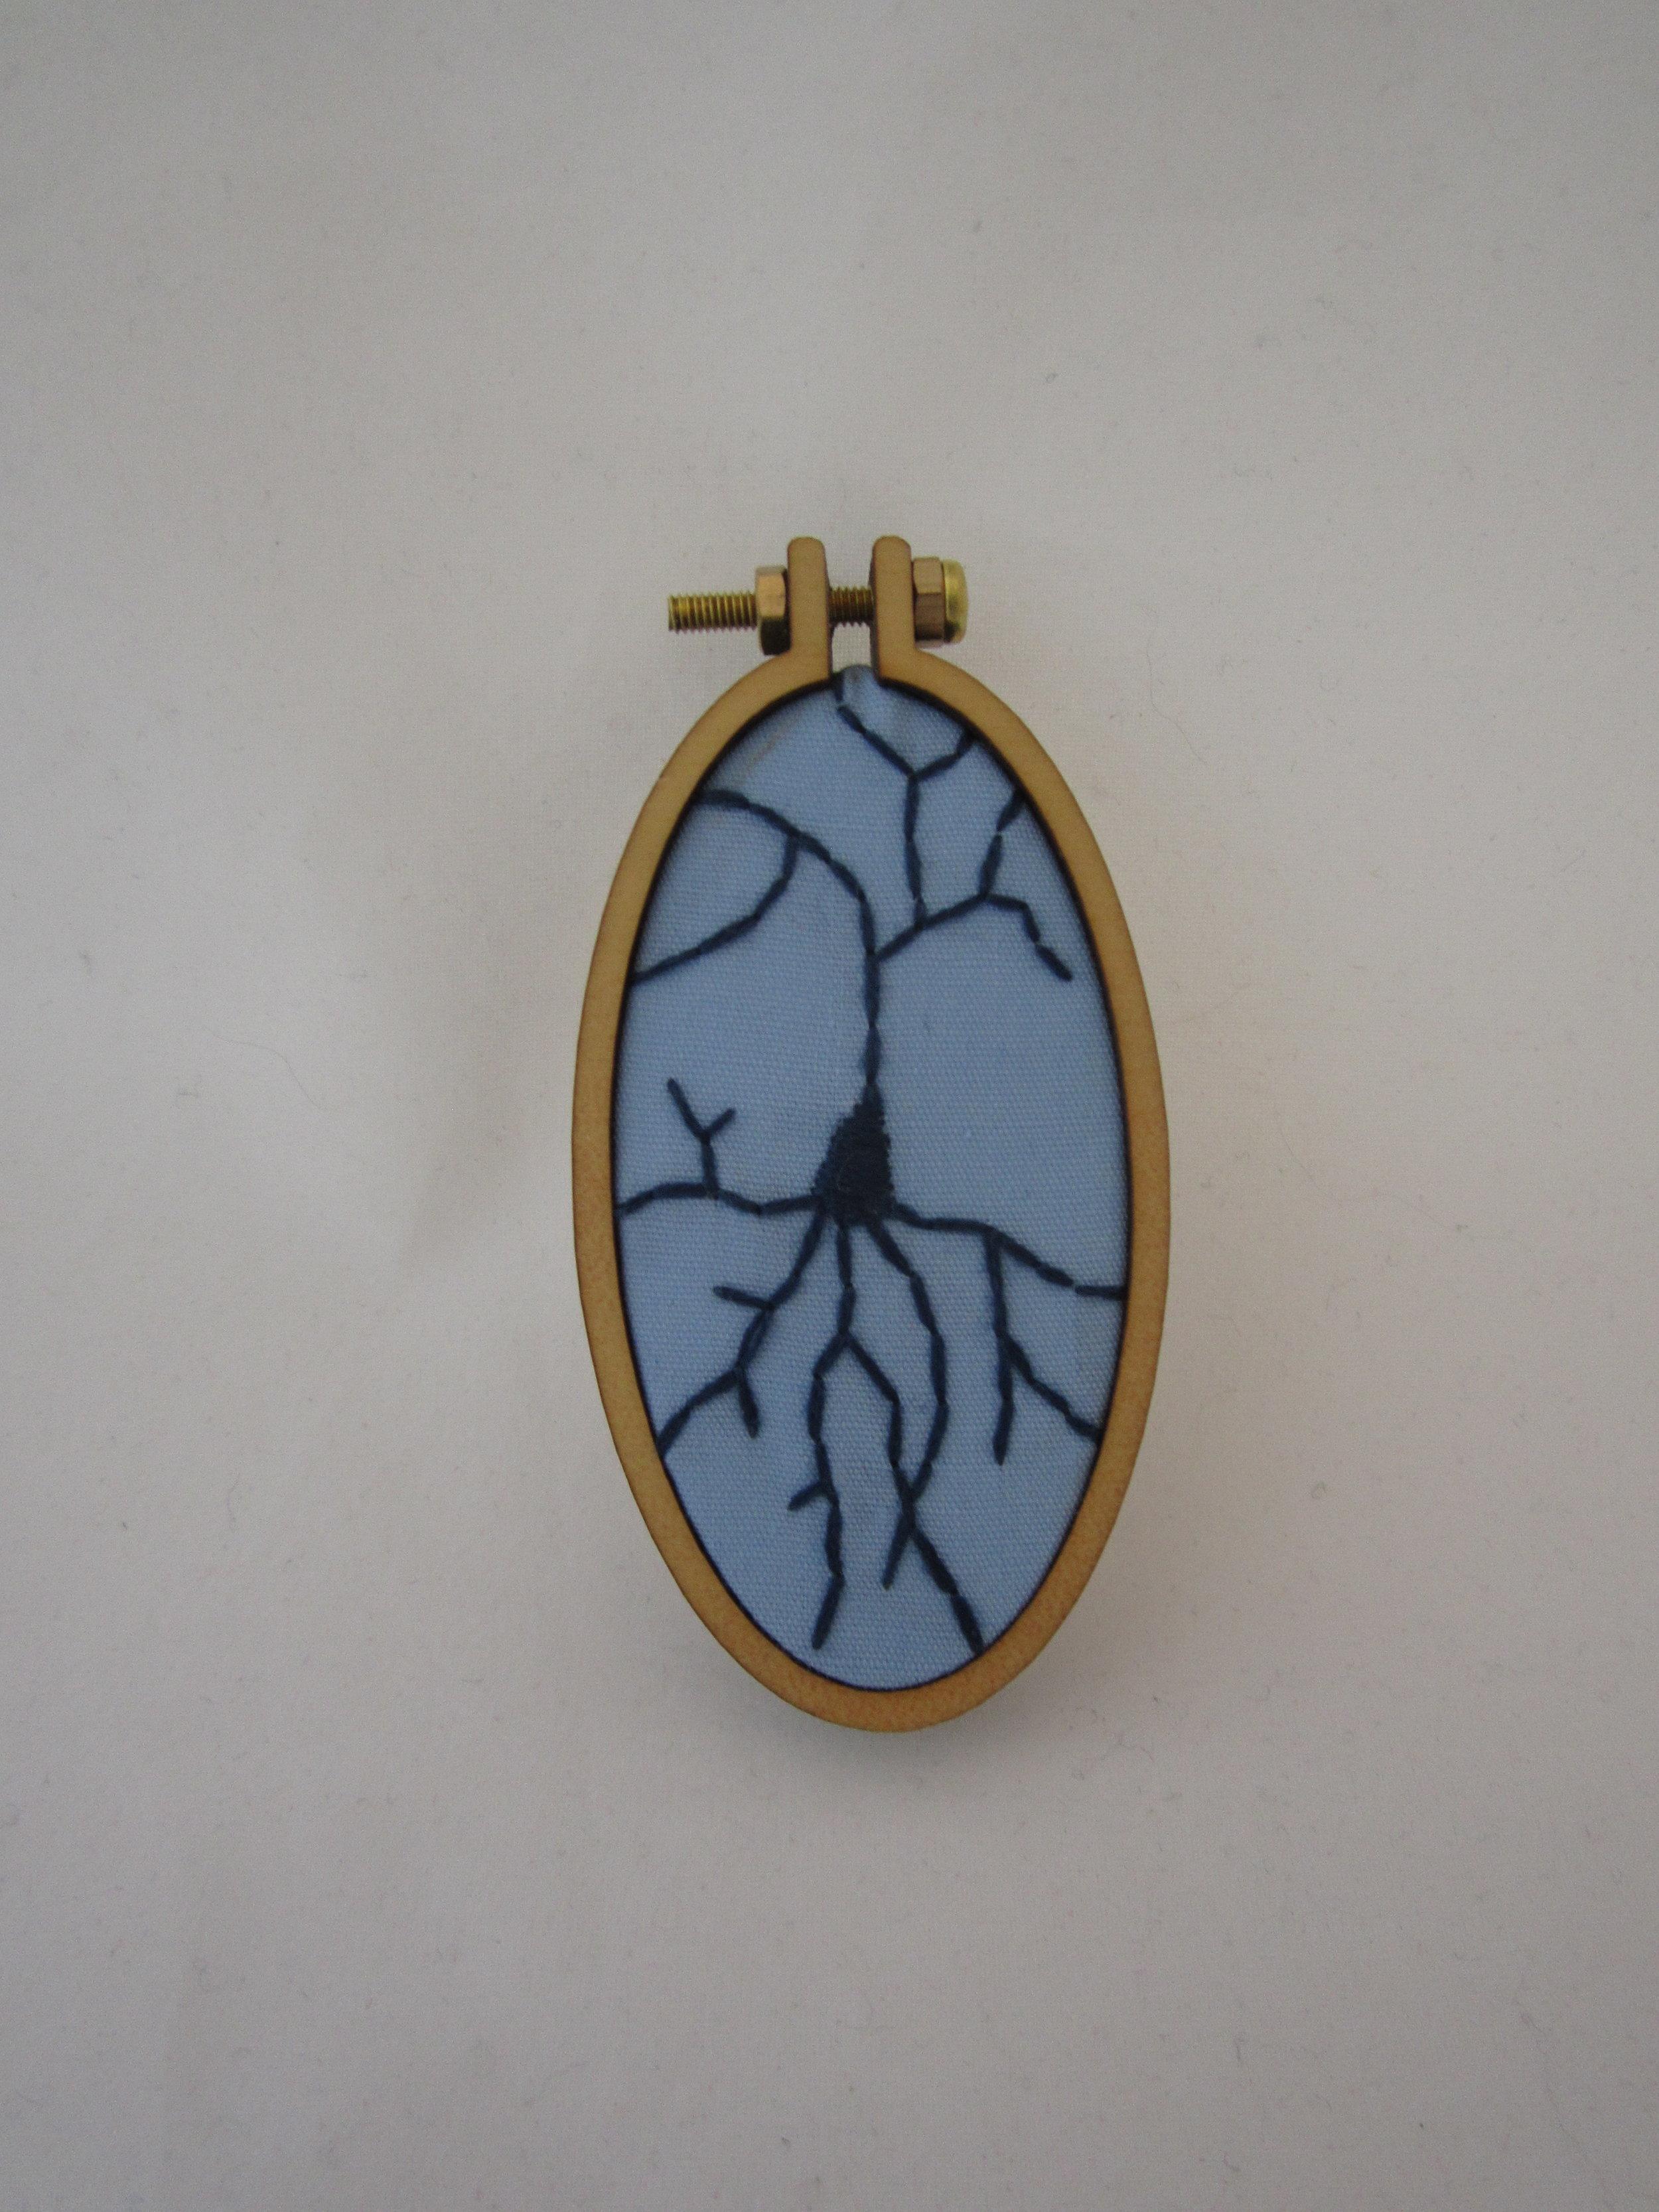 Blue Neuron Mini Hoop Pin 2.JPG